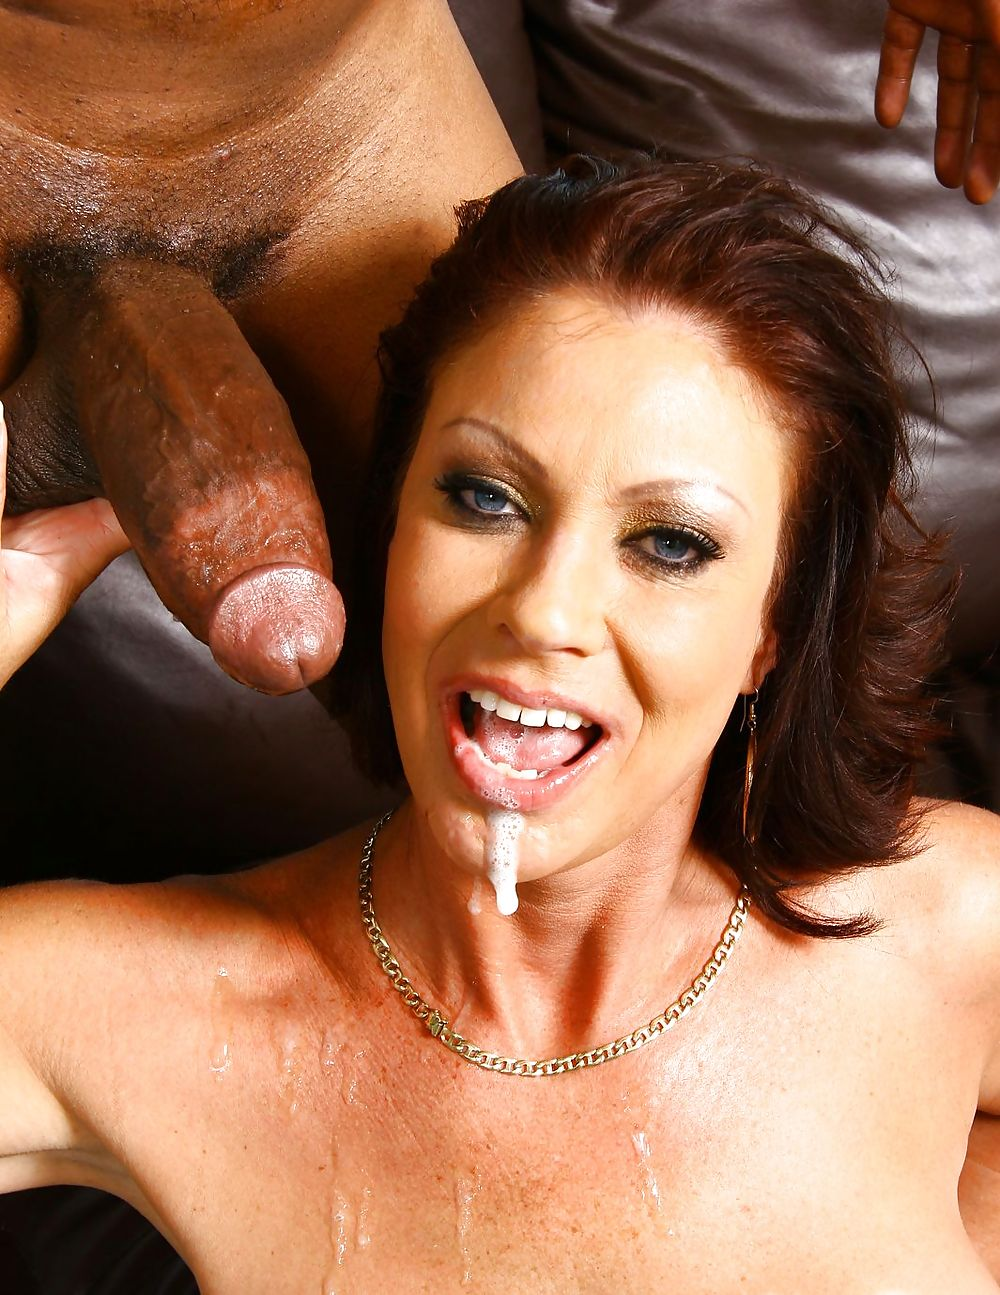 vanessa-dollar-v-porno